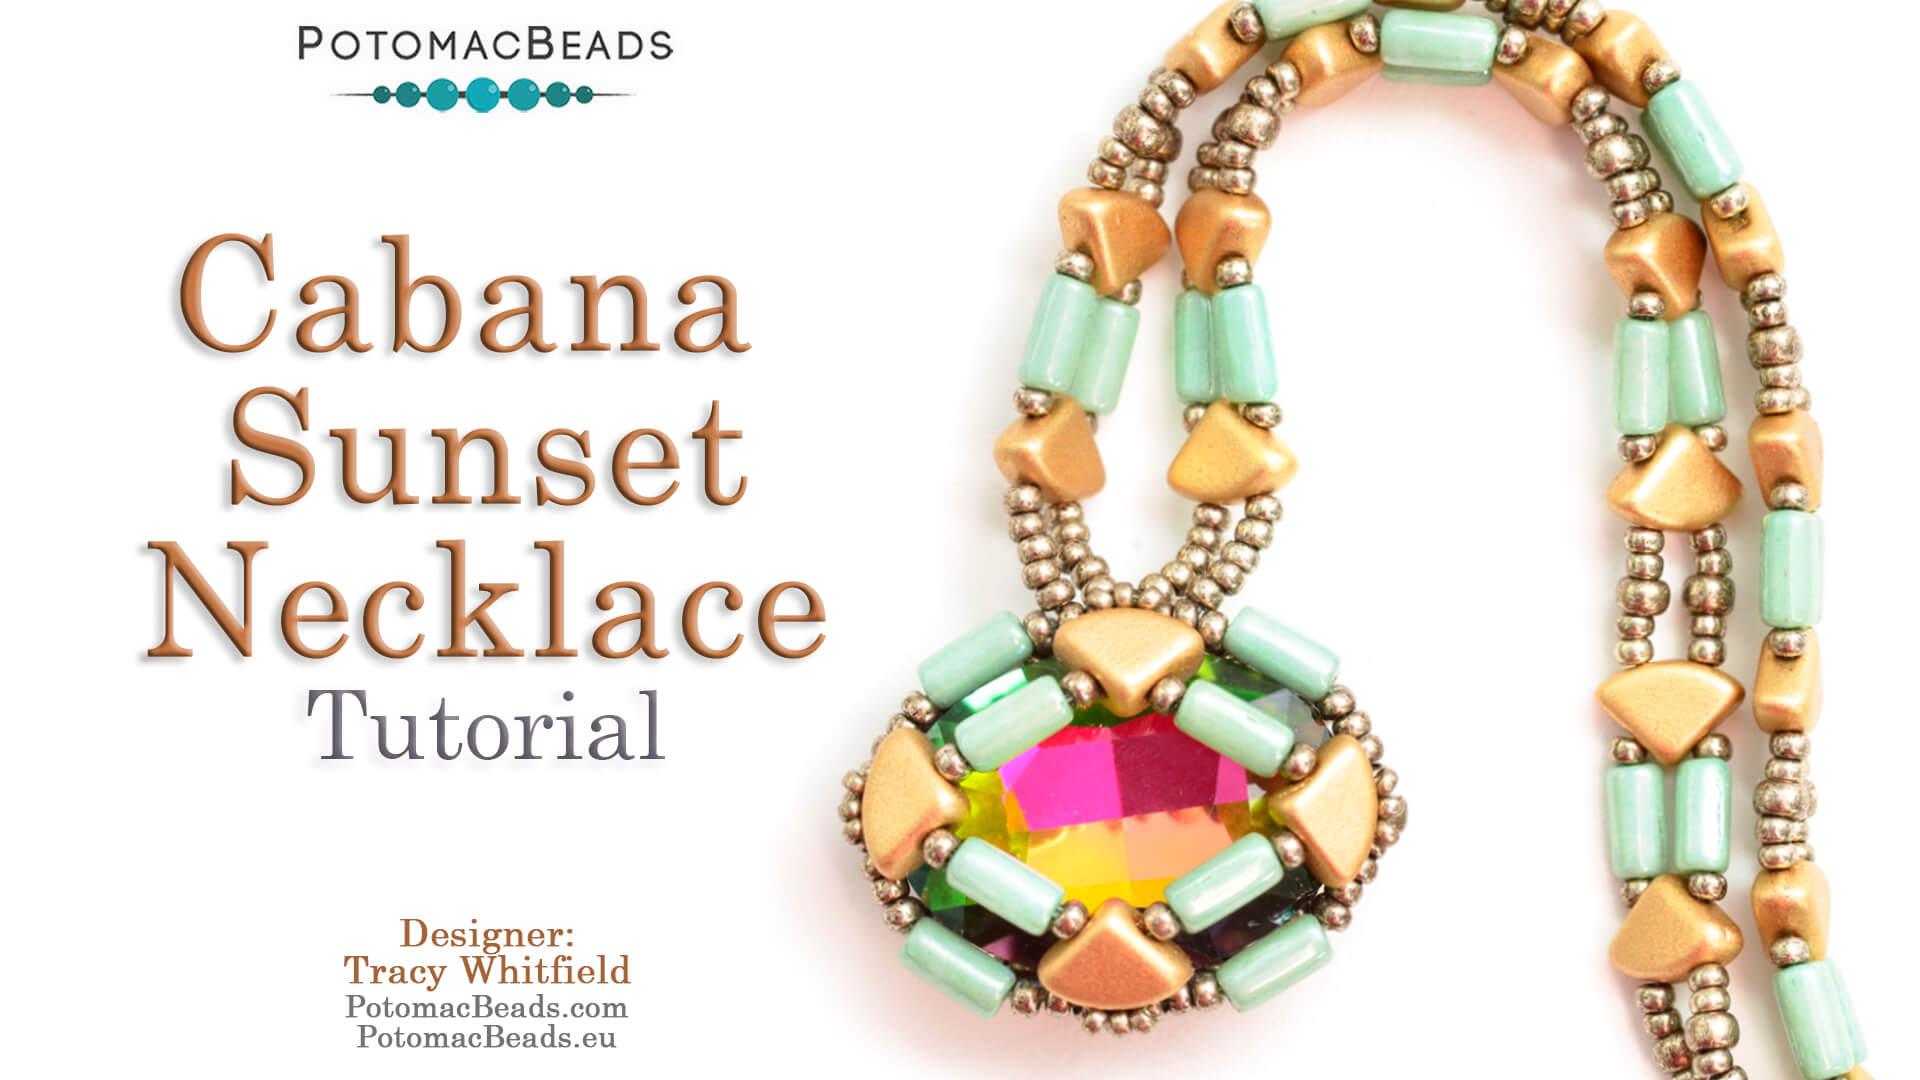 How to Bead Jewelry / Beading Tutorials & Jewel Making Videos / Bead Weaving Tutorials & Necklace Tutorial / Cabana Sunset Necklace Tutorial